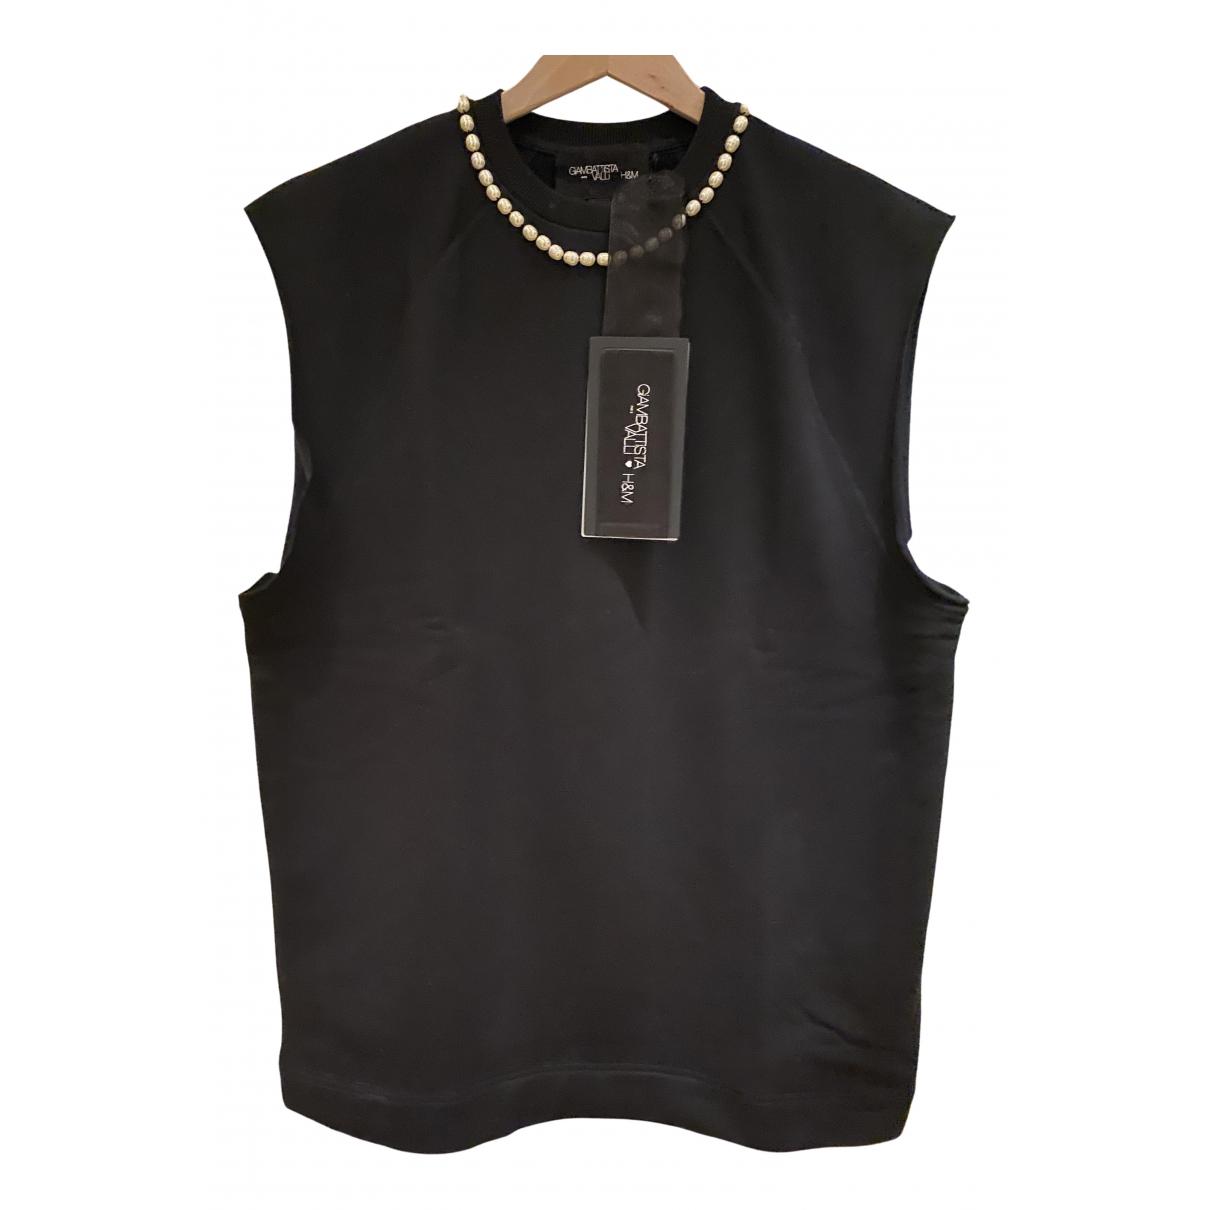 Giambattista Valli X H&m N Black Cotton  top for Women M International